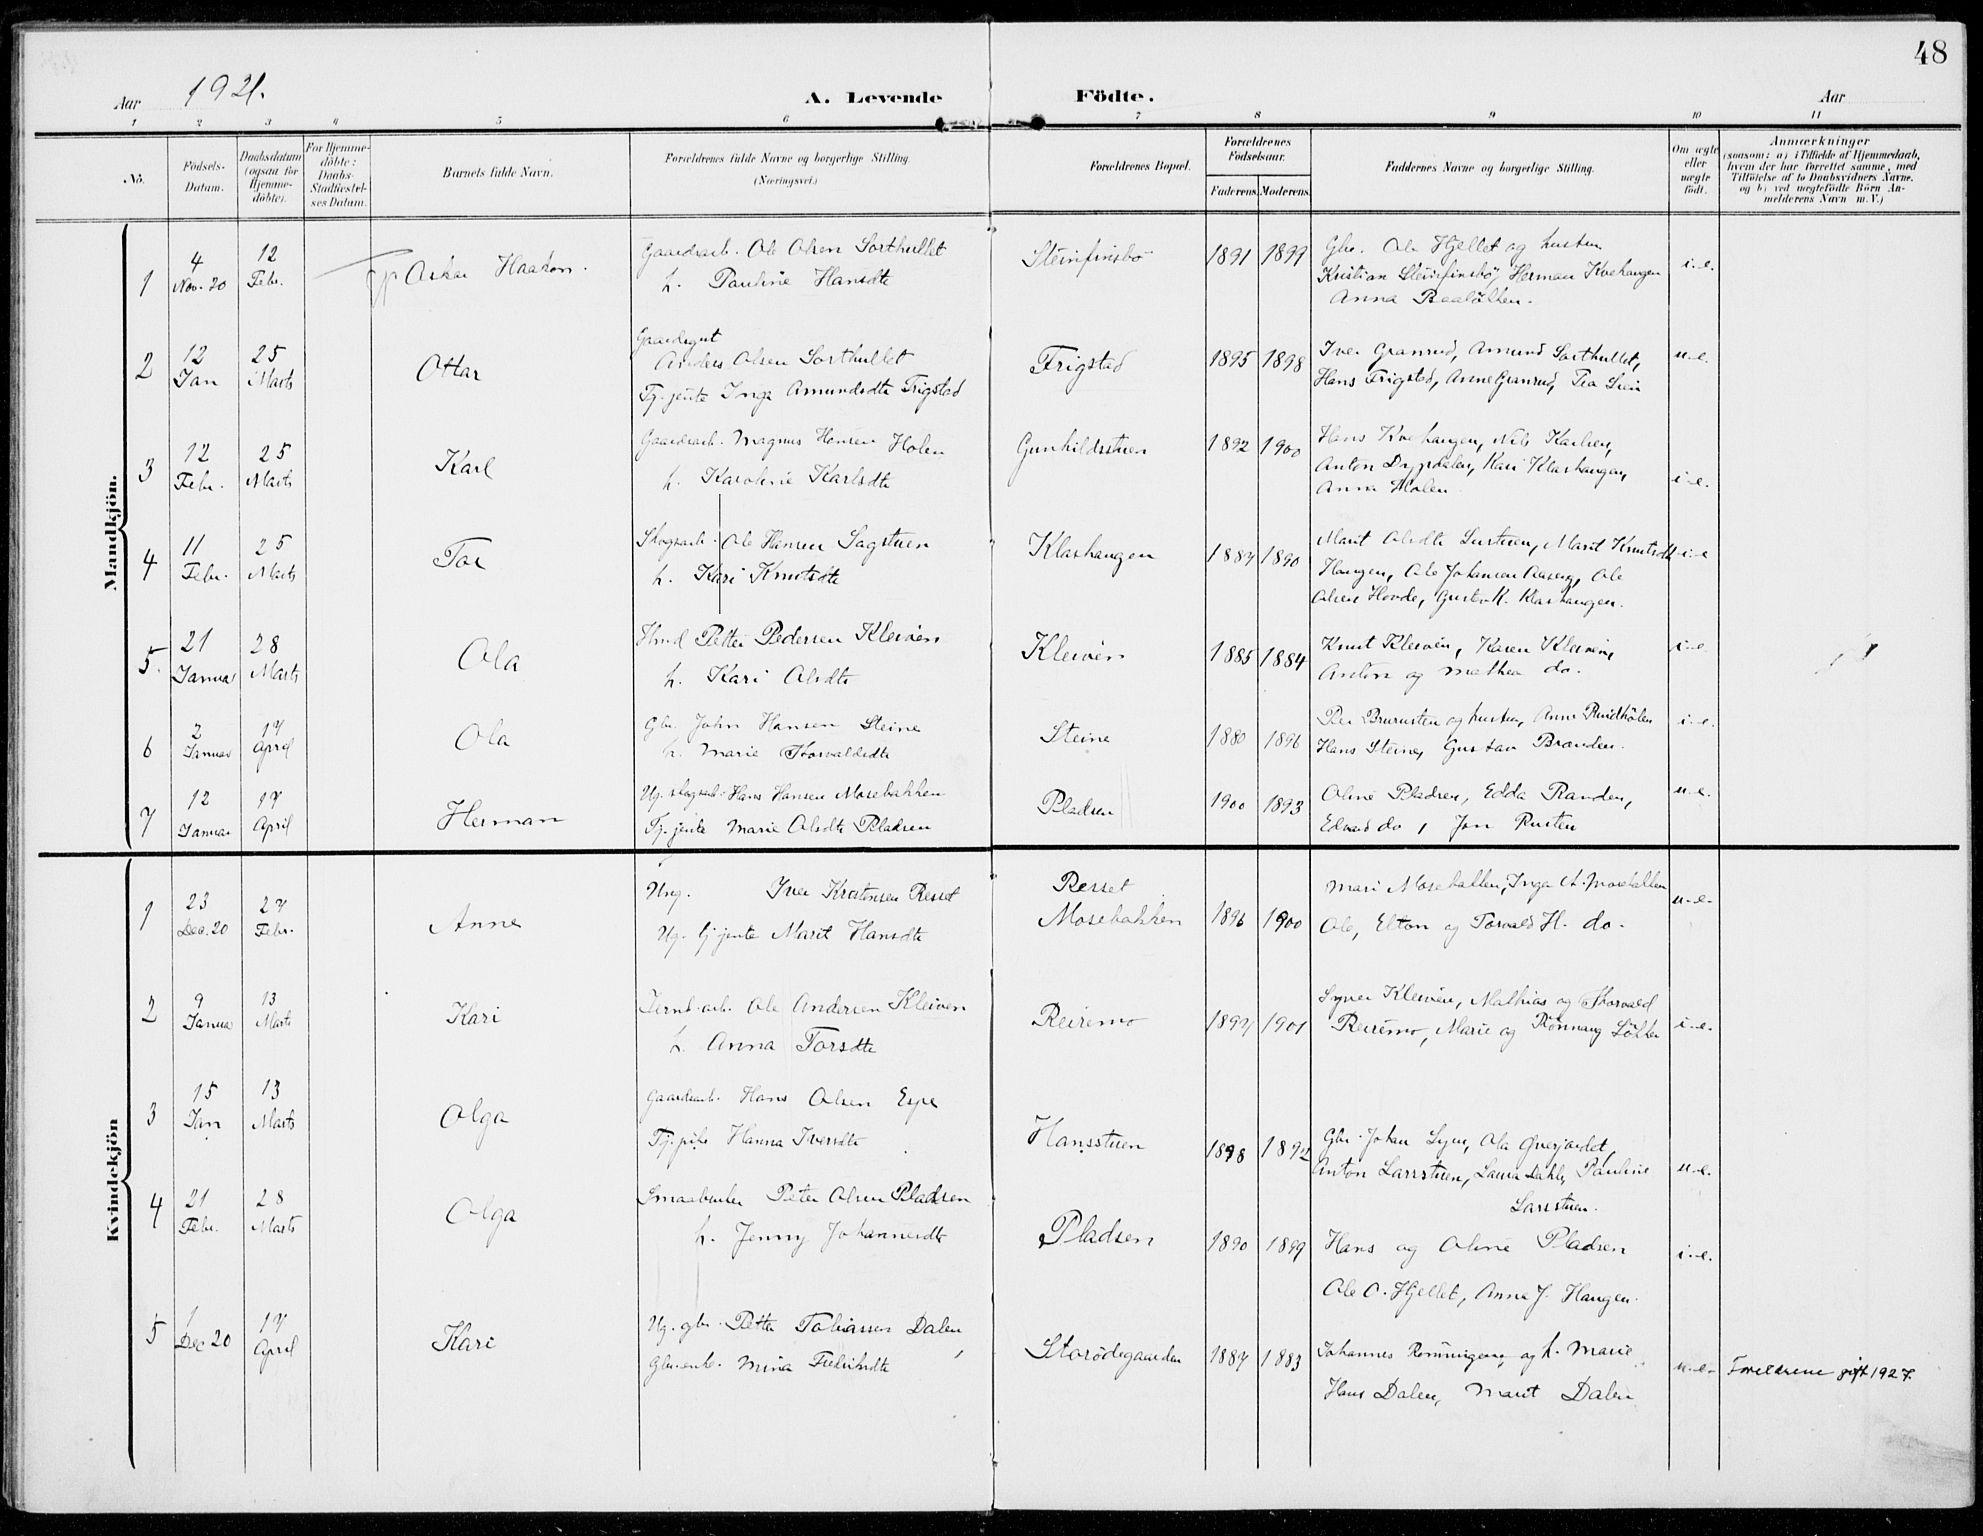 SAH, Sel prestekontor, Ministerialbok nr. 1, 1905-1922, s. 48